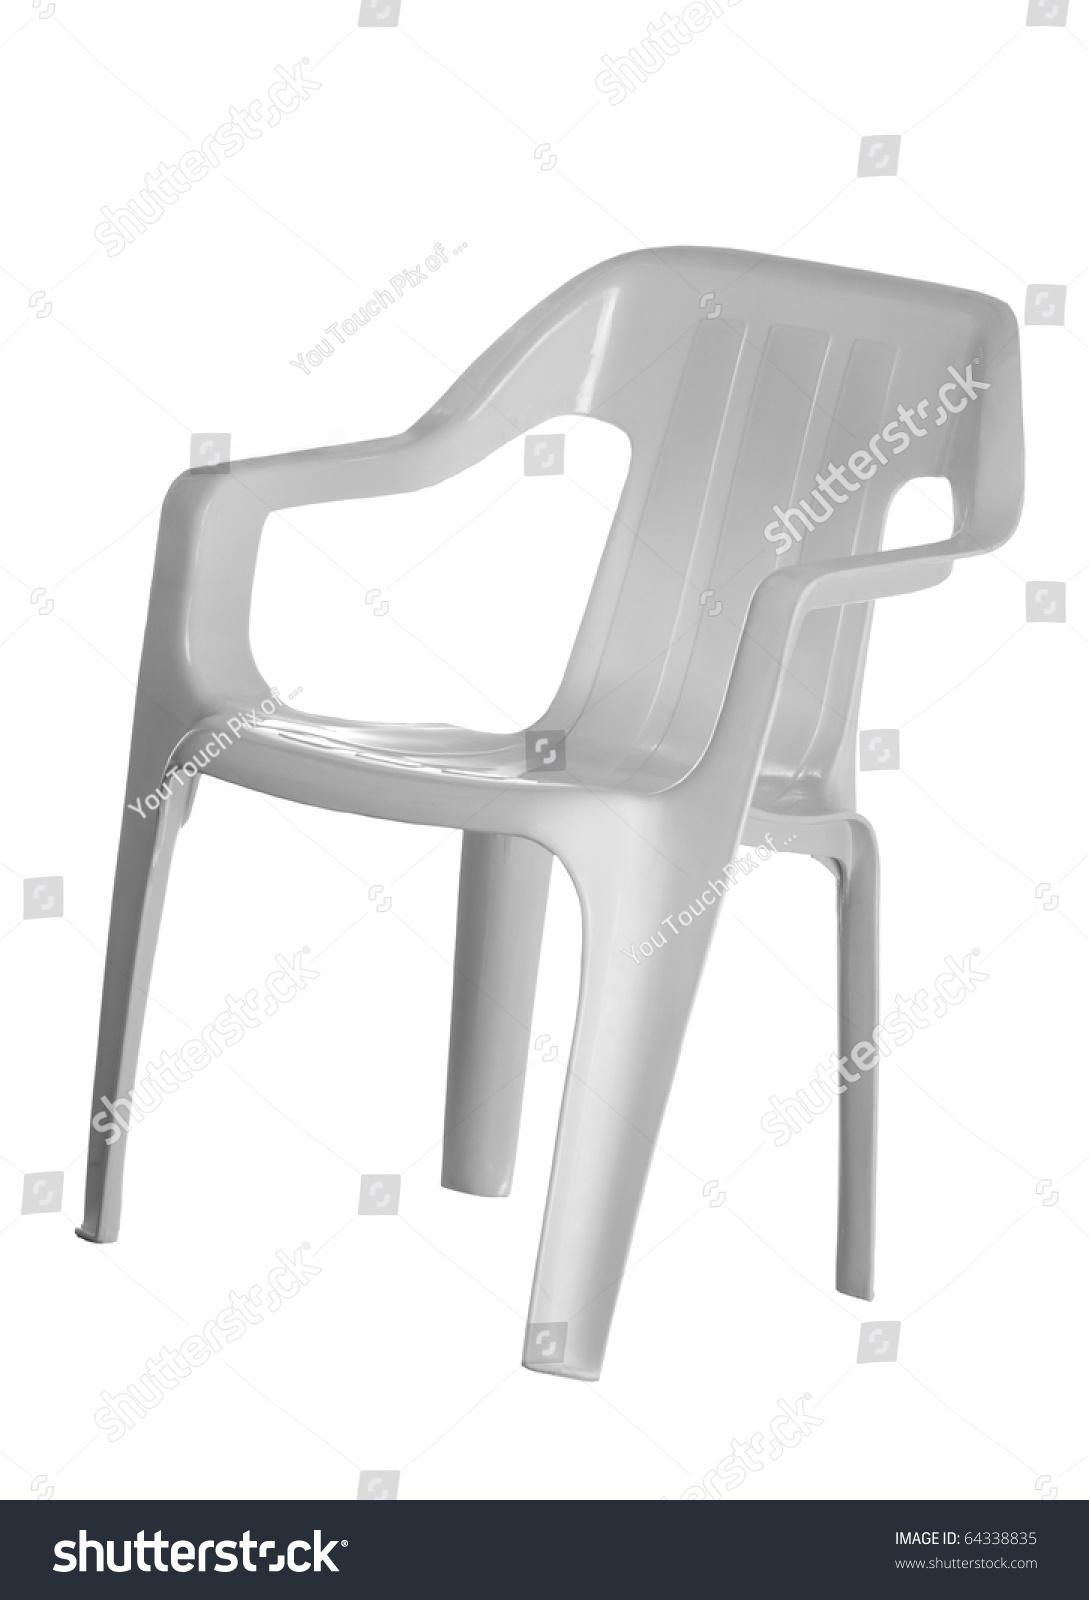 White plastic chair for kids isolated on white background stock photo 64338835 shutterstock - Witte plastic stoel ...